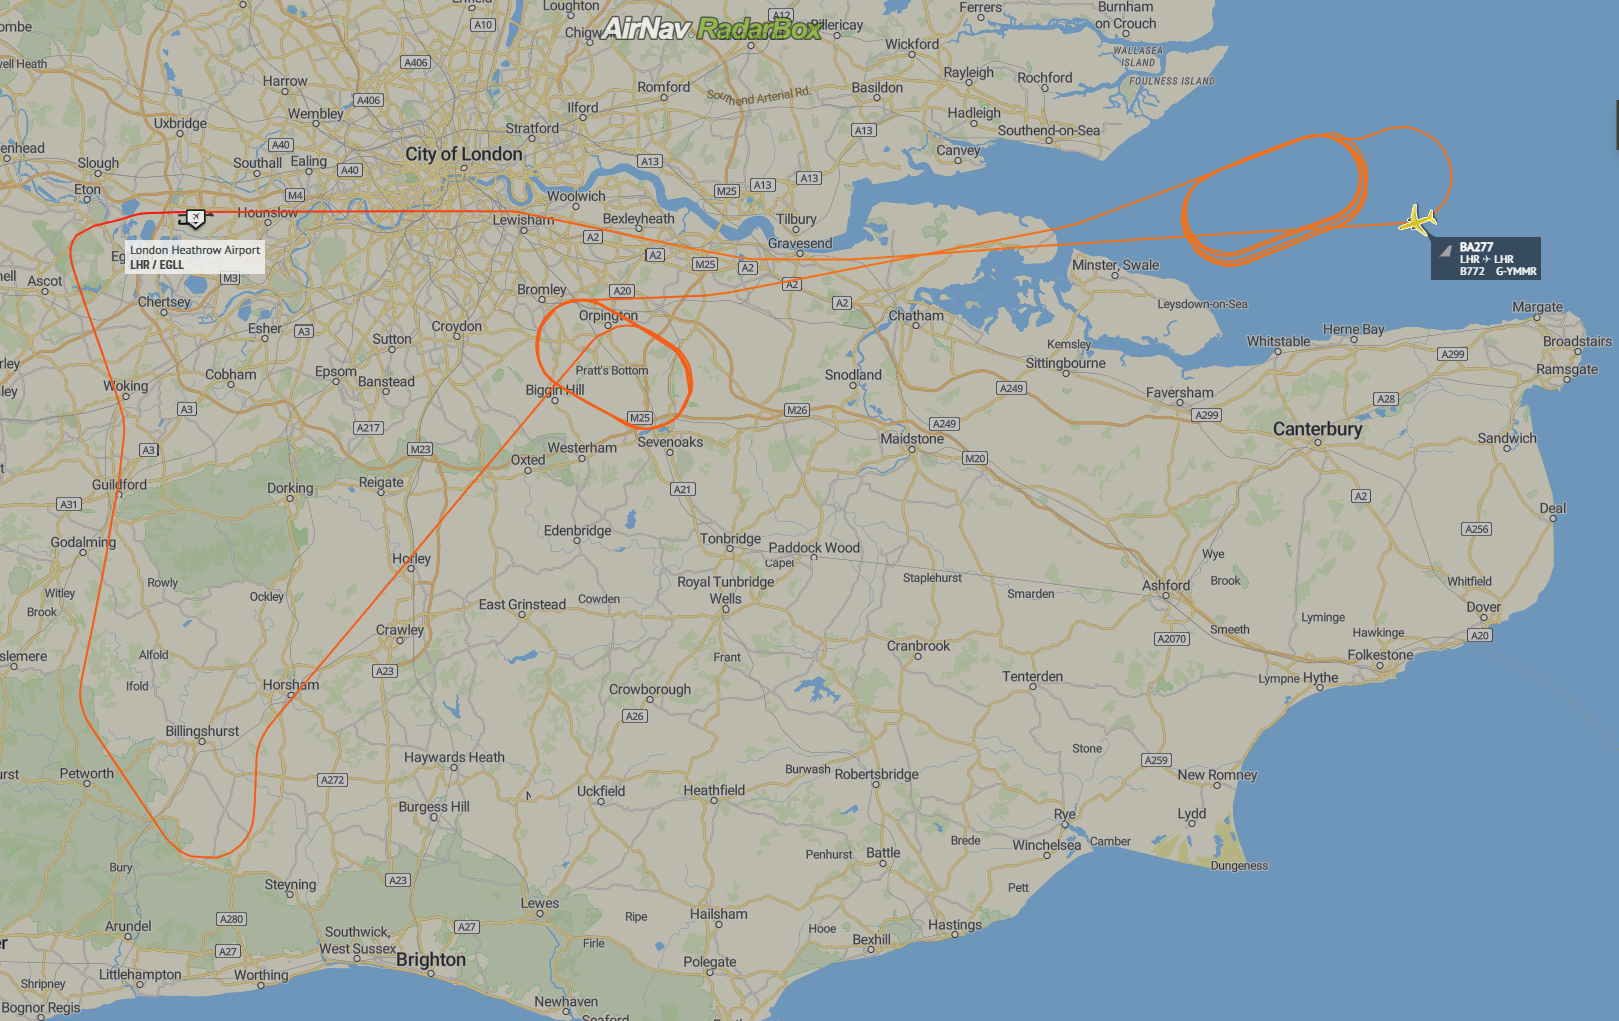 Map showing flight path of G-YMMR